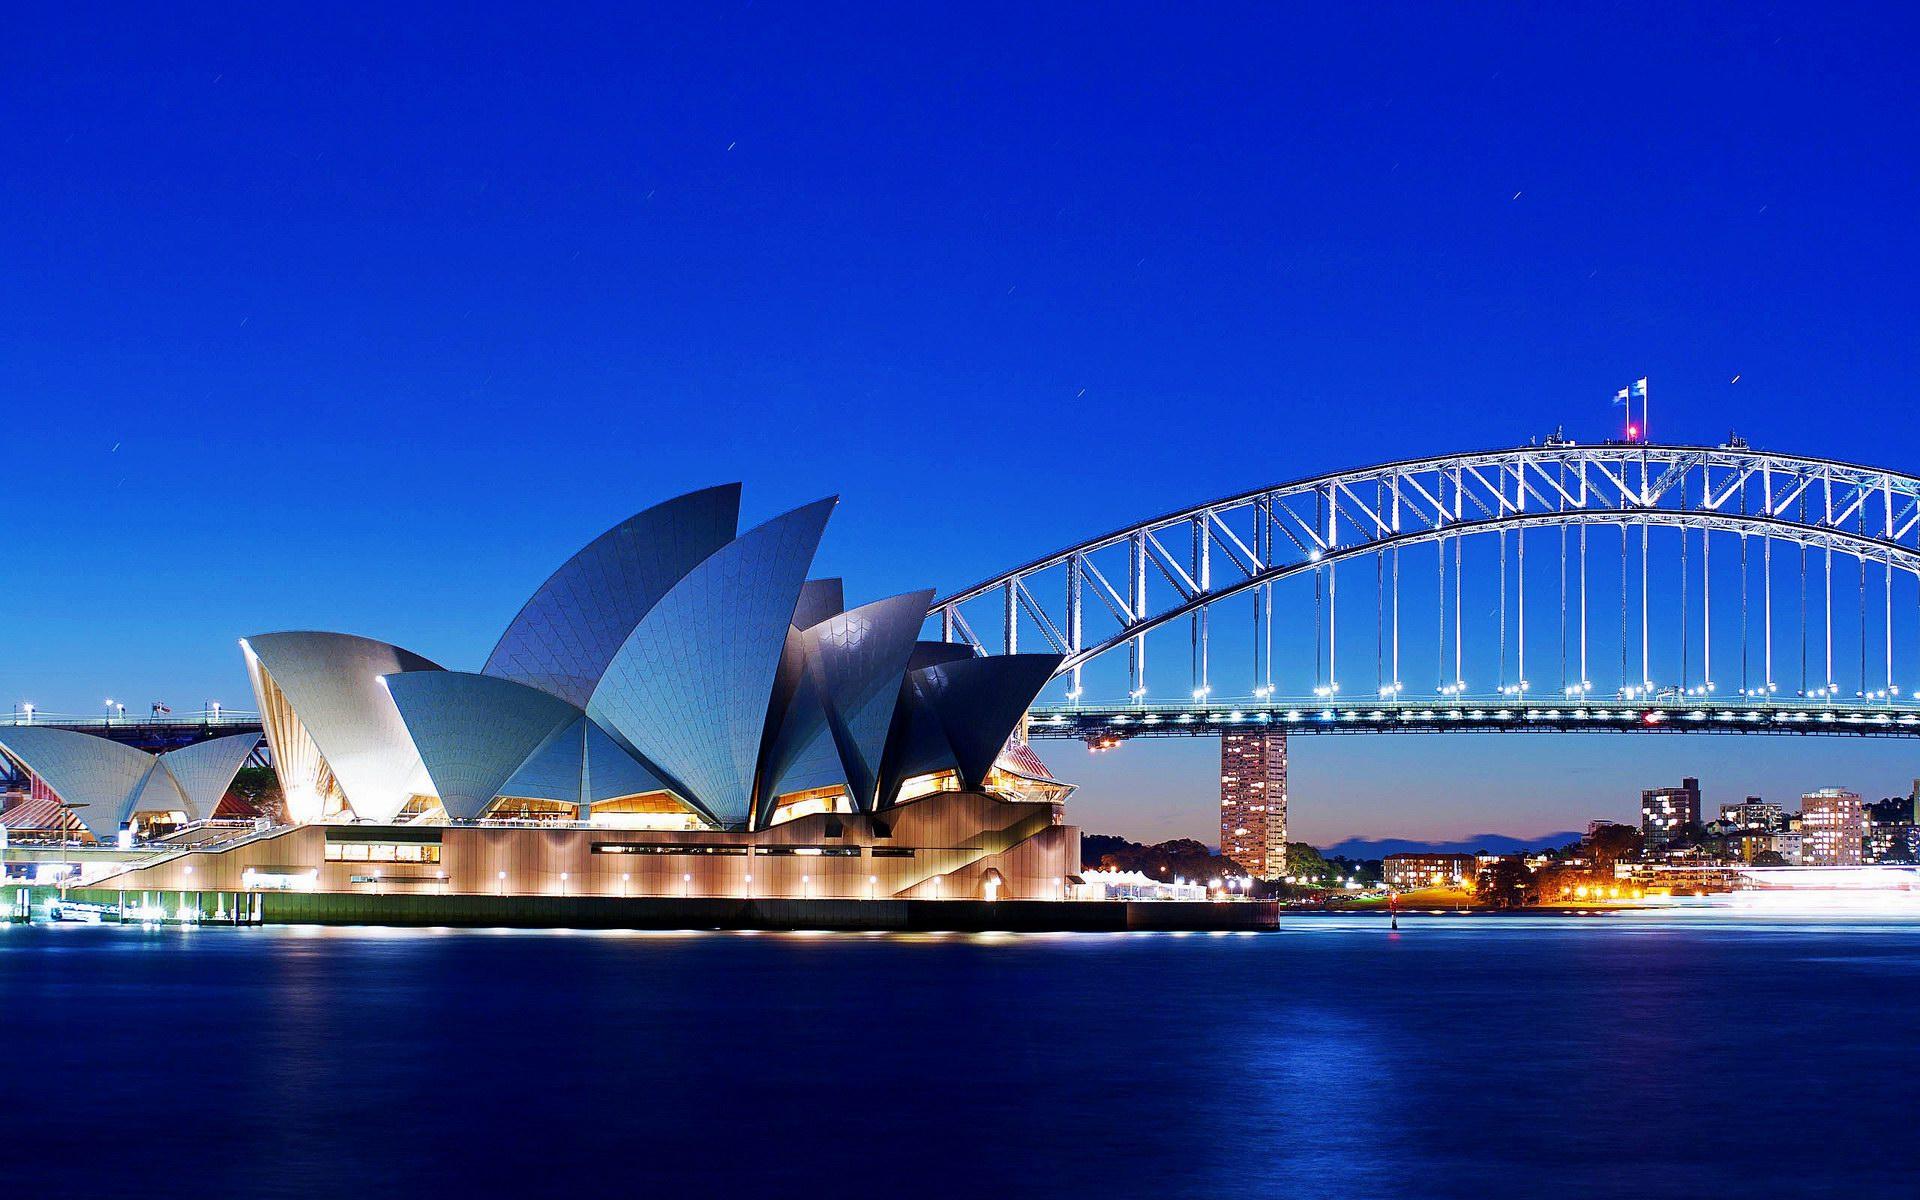 Sydney Opera House Wallpapers HD Widescreen Desktop 1920x1200